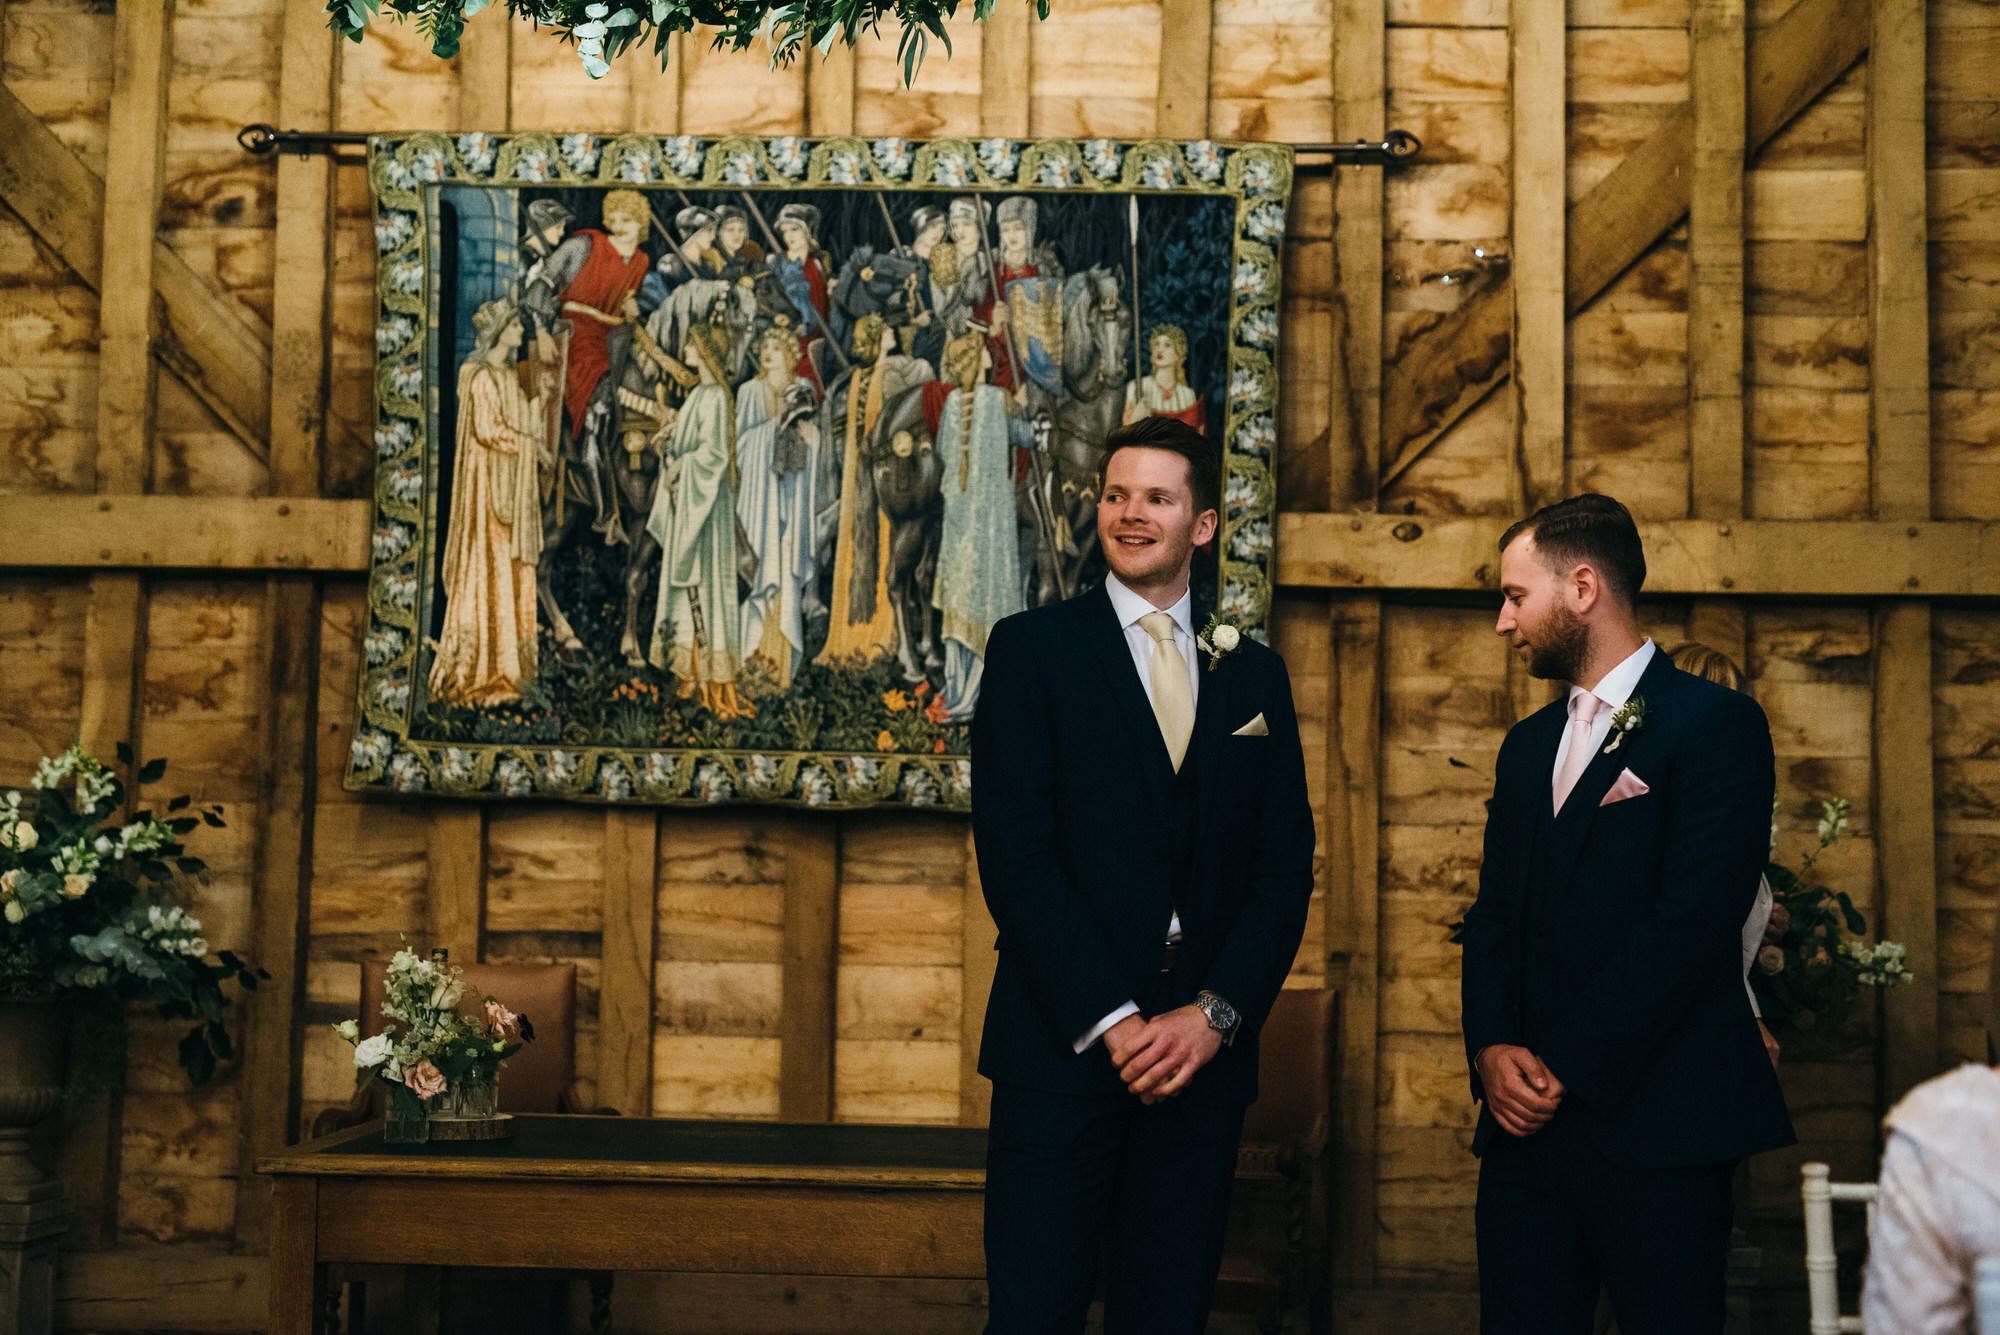 Colville hall barn groom waiting